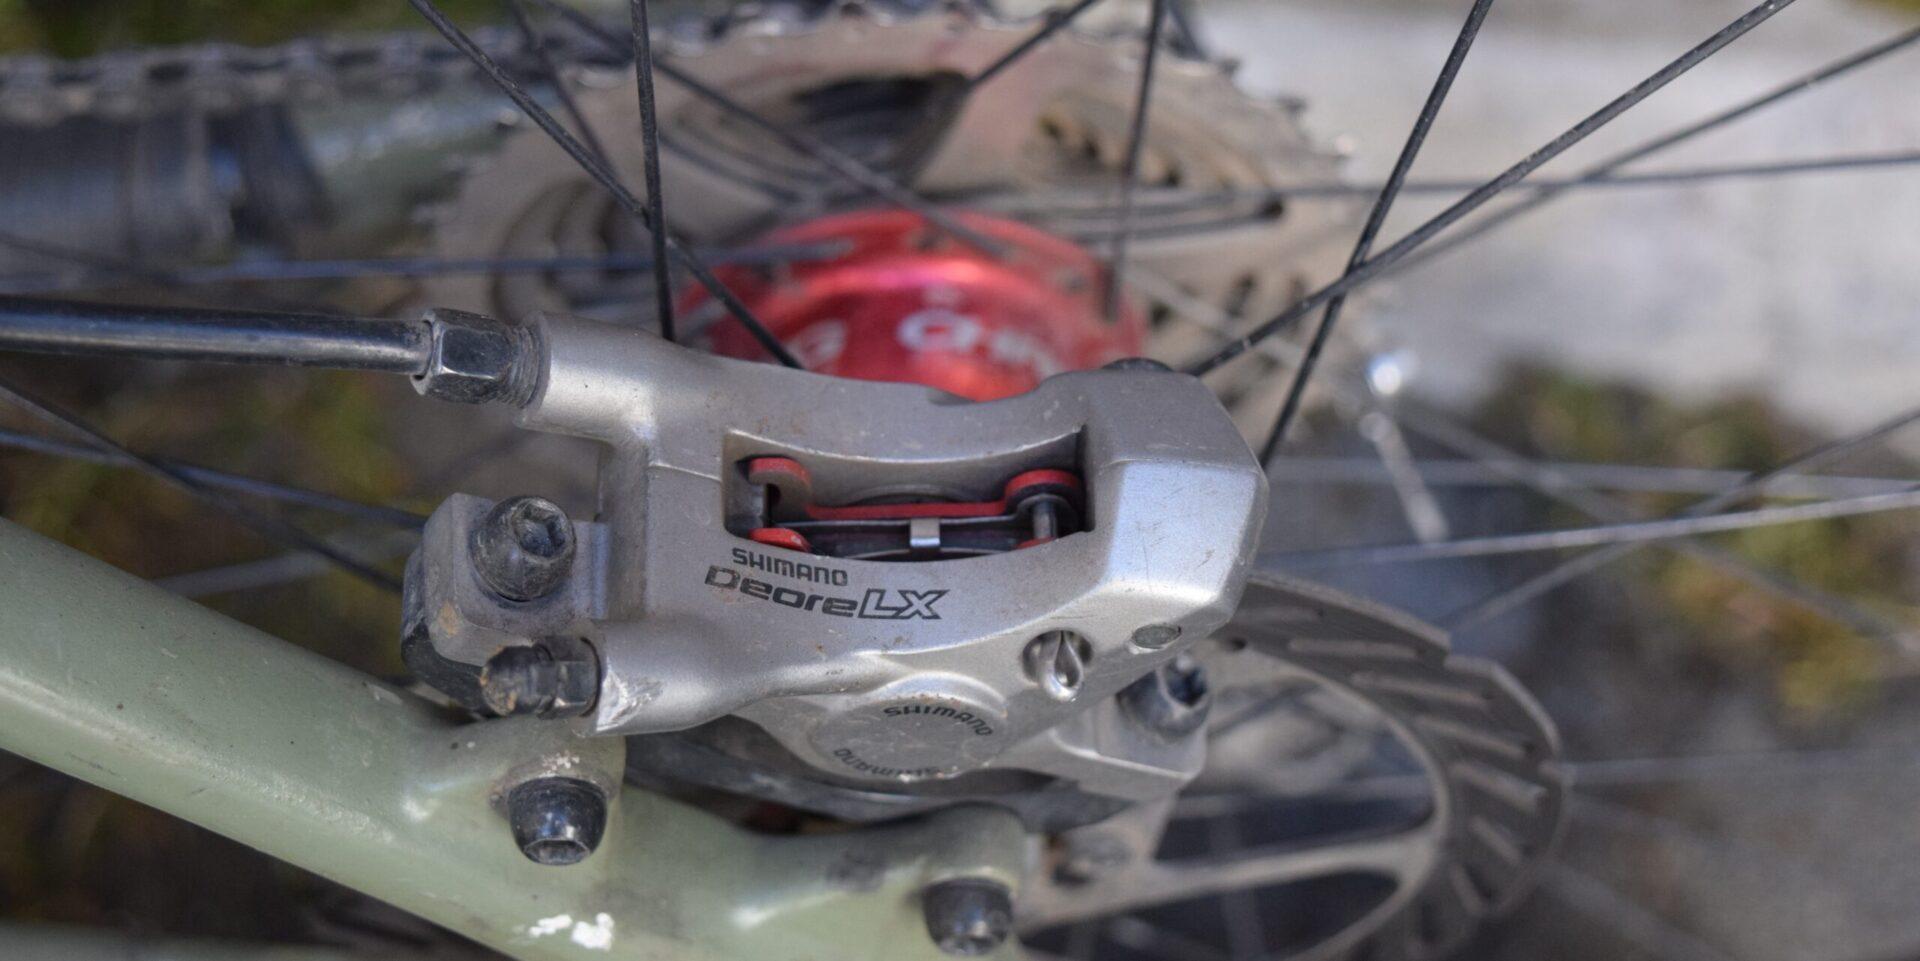 Bike Check: Clay's Mystery Machine – Broad Street Cycles